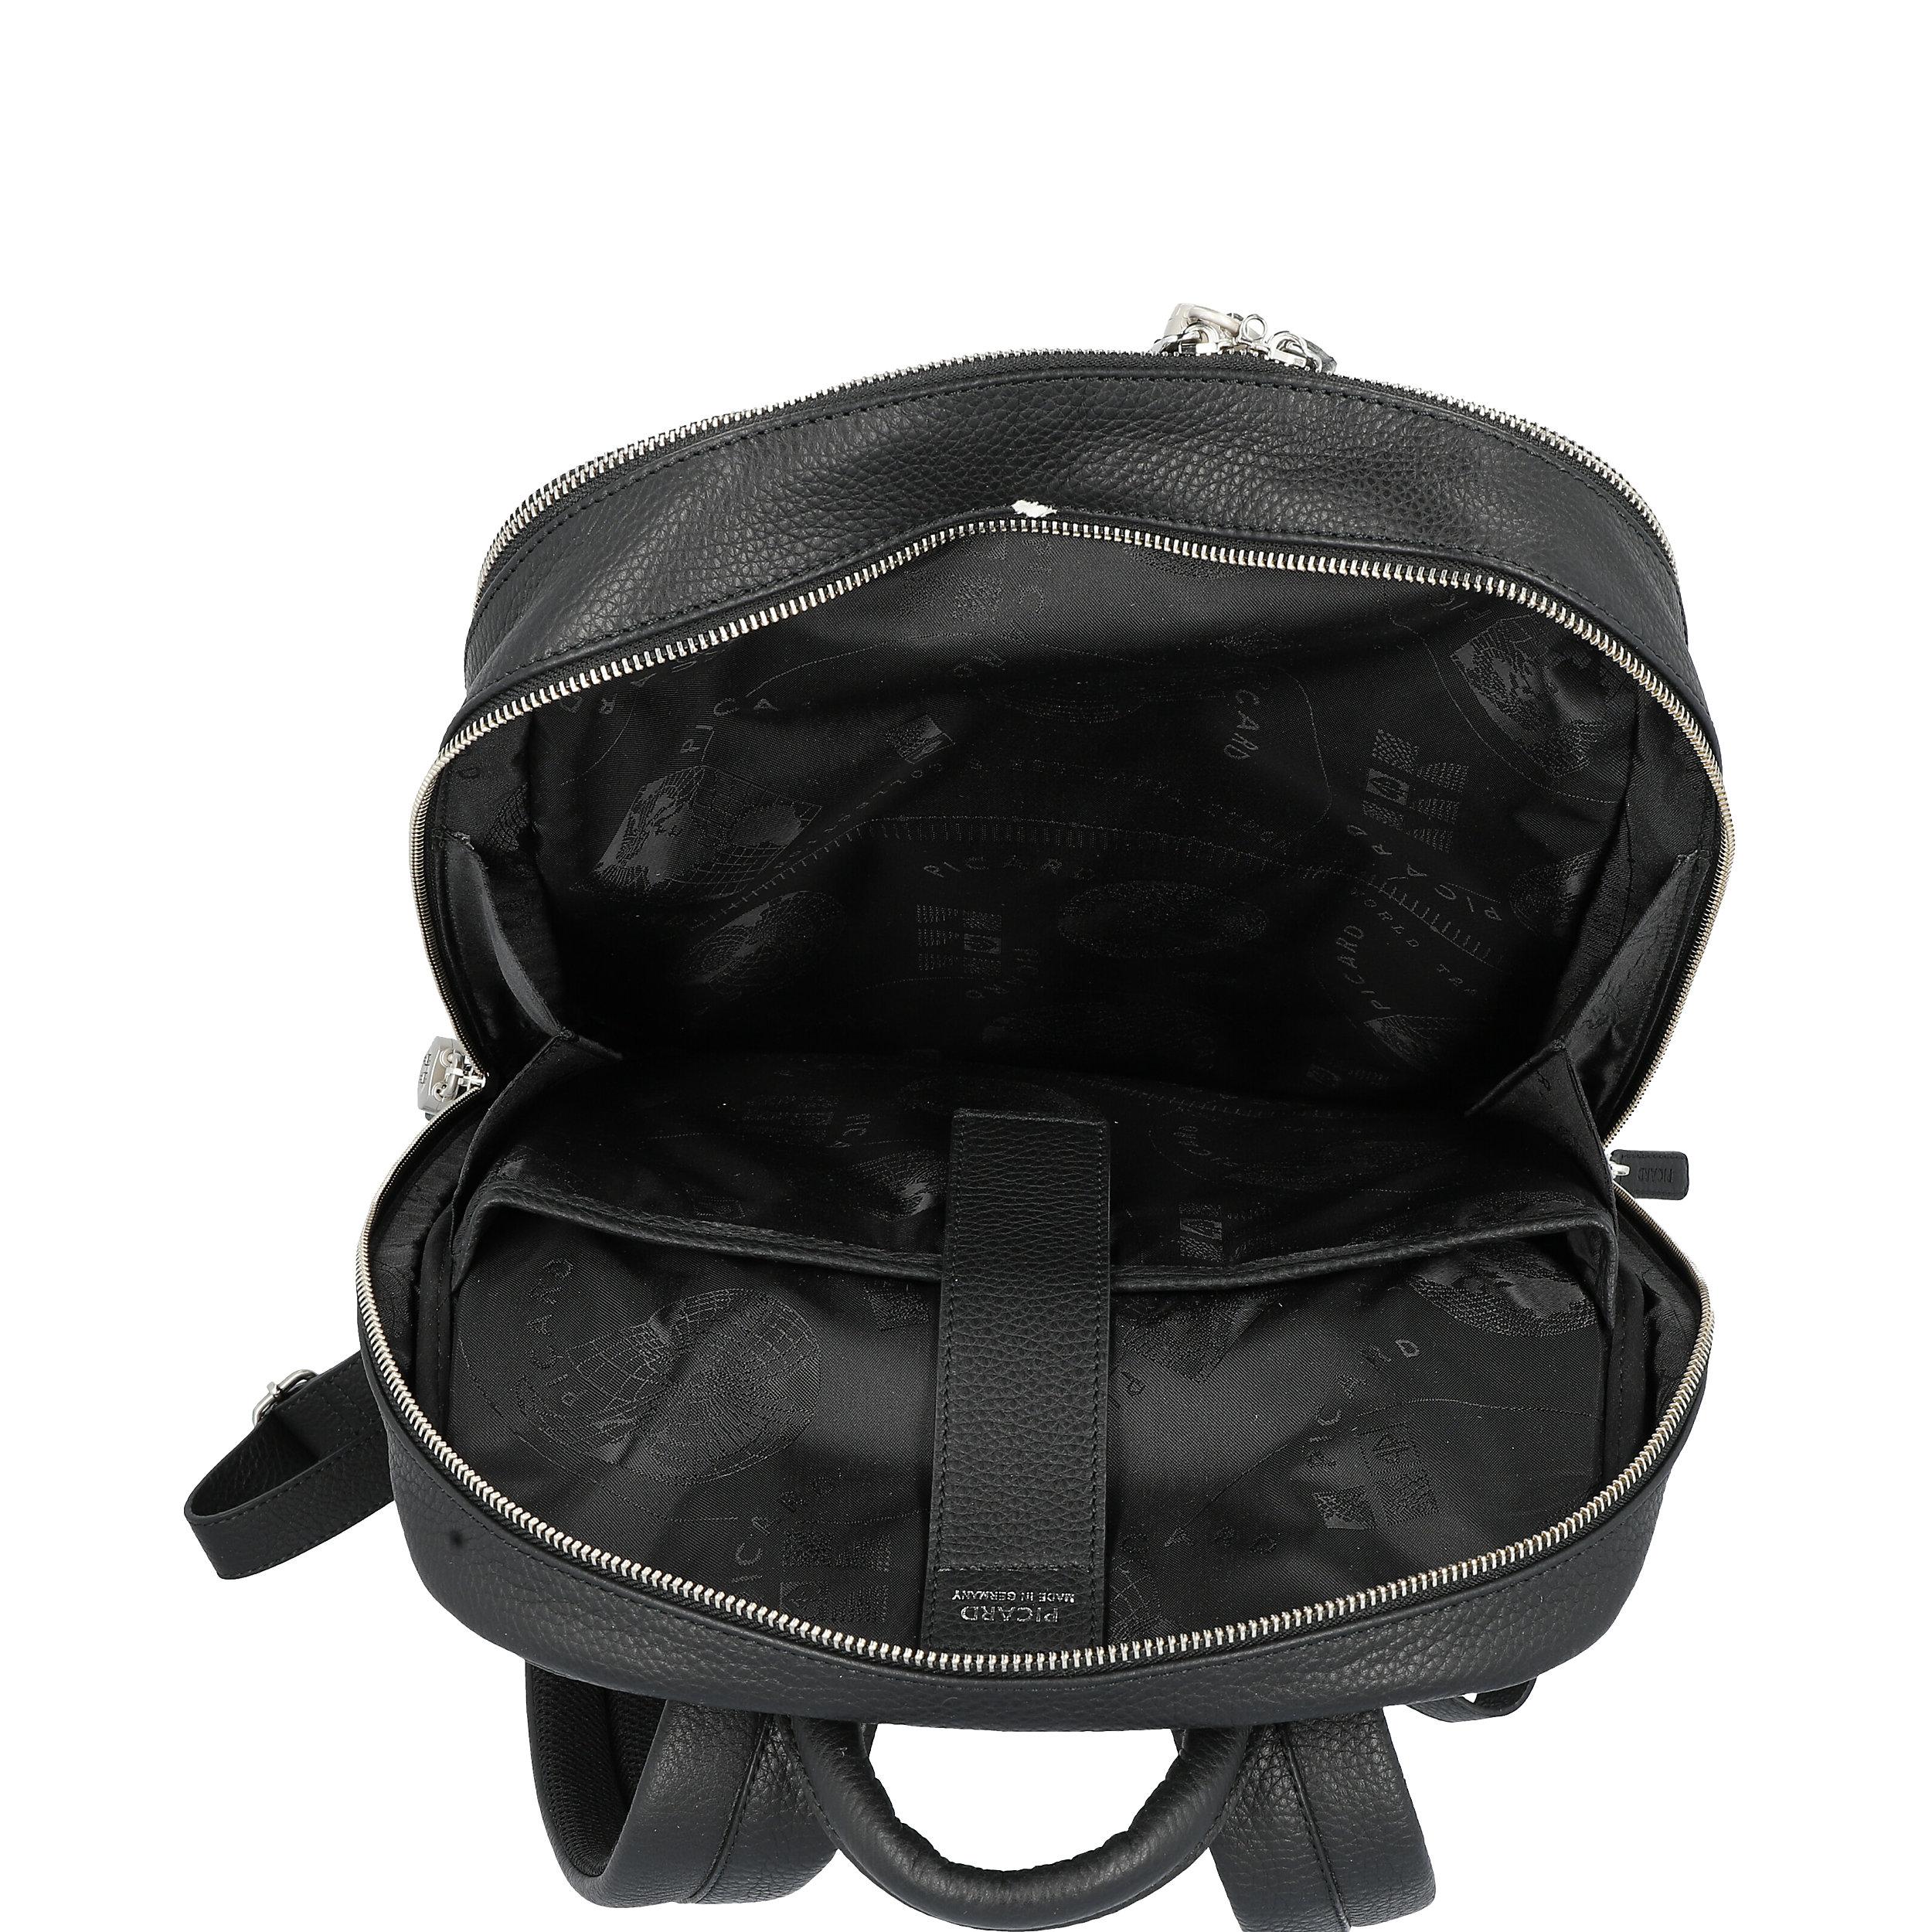 Backpack Origin S